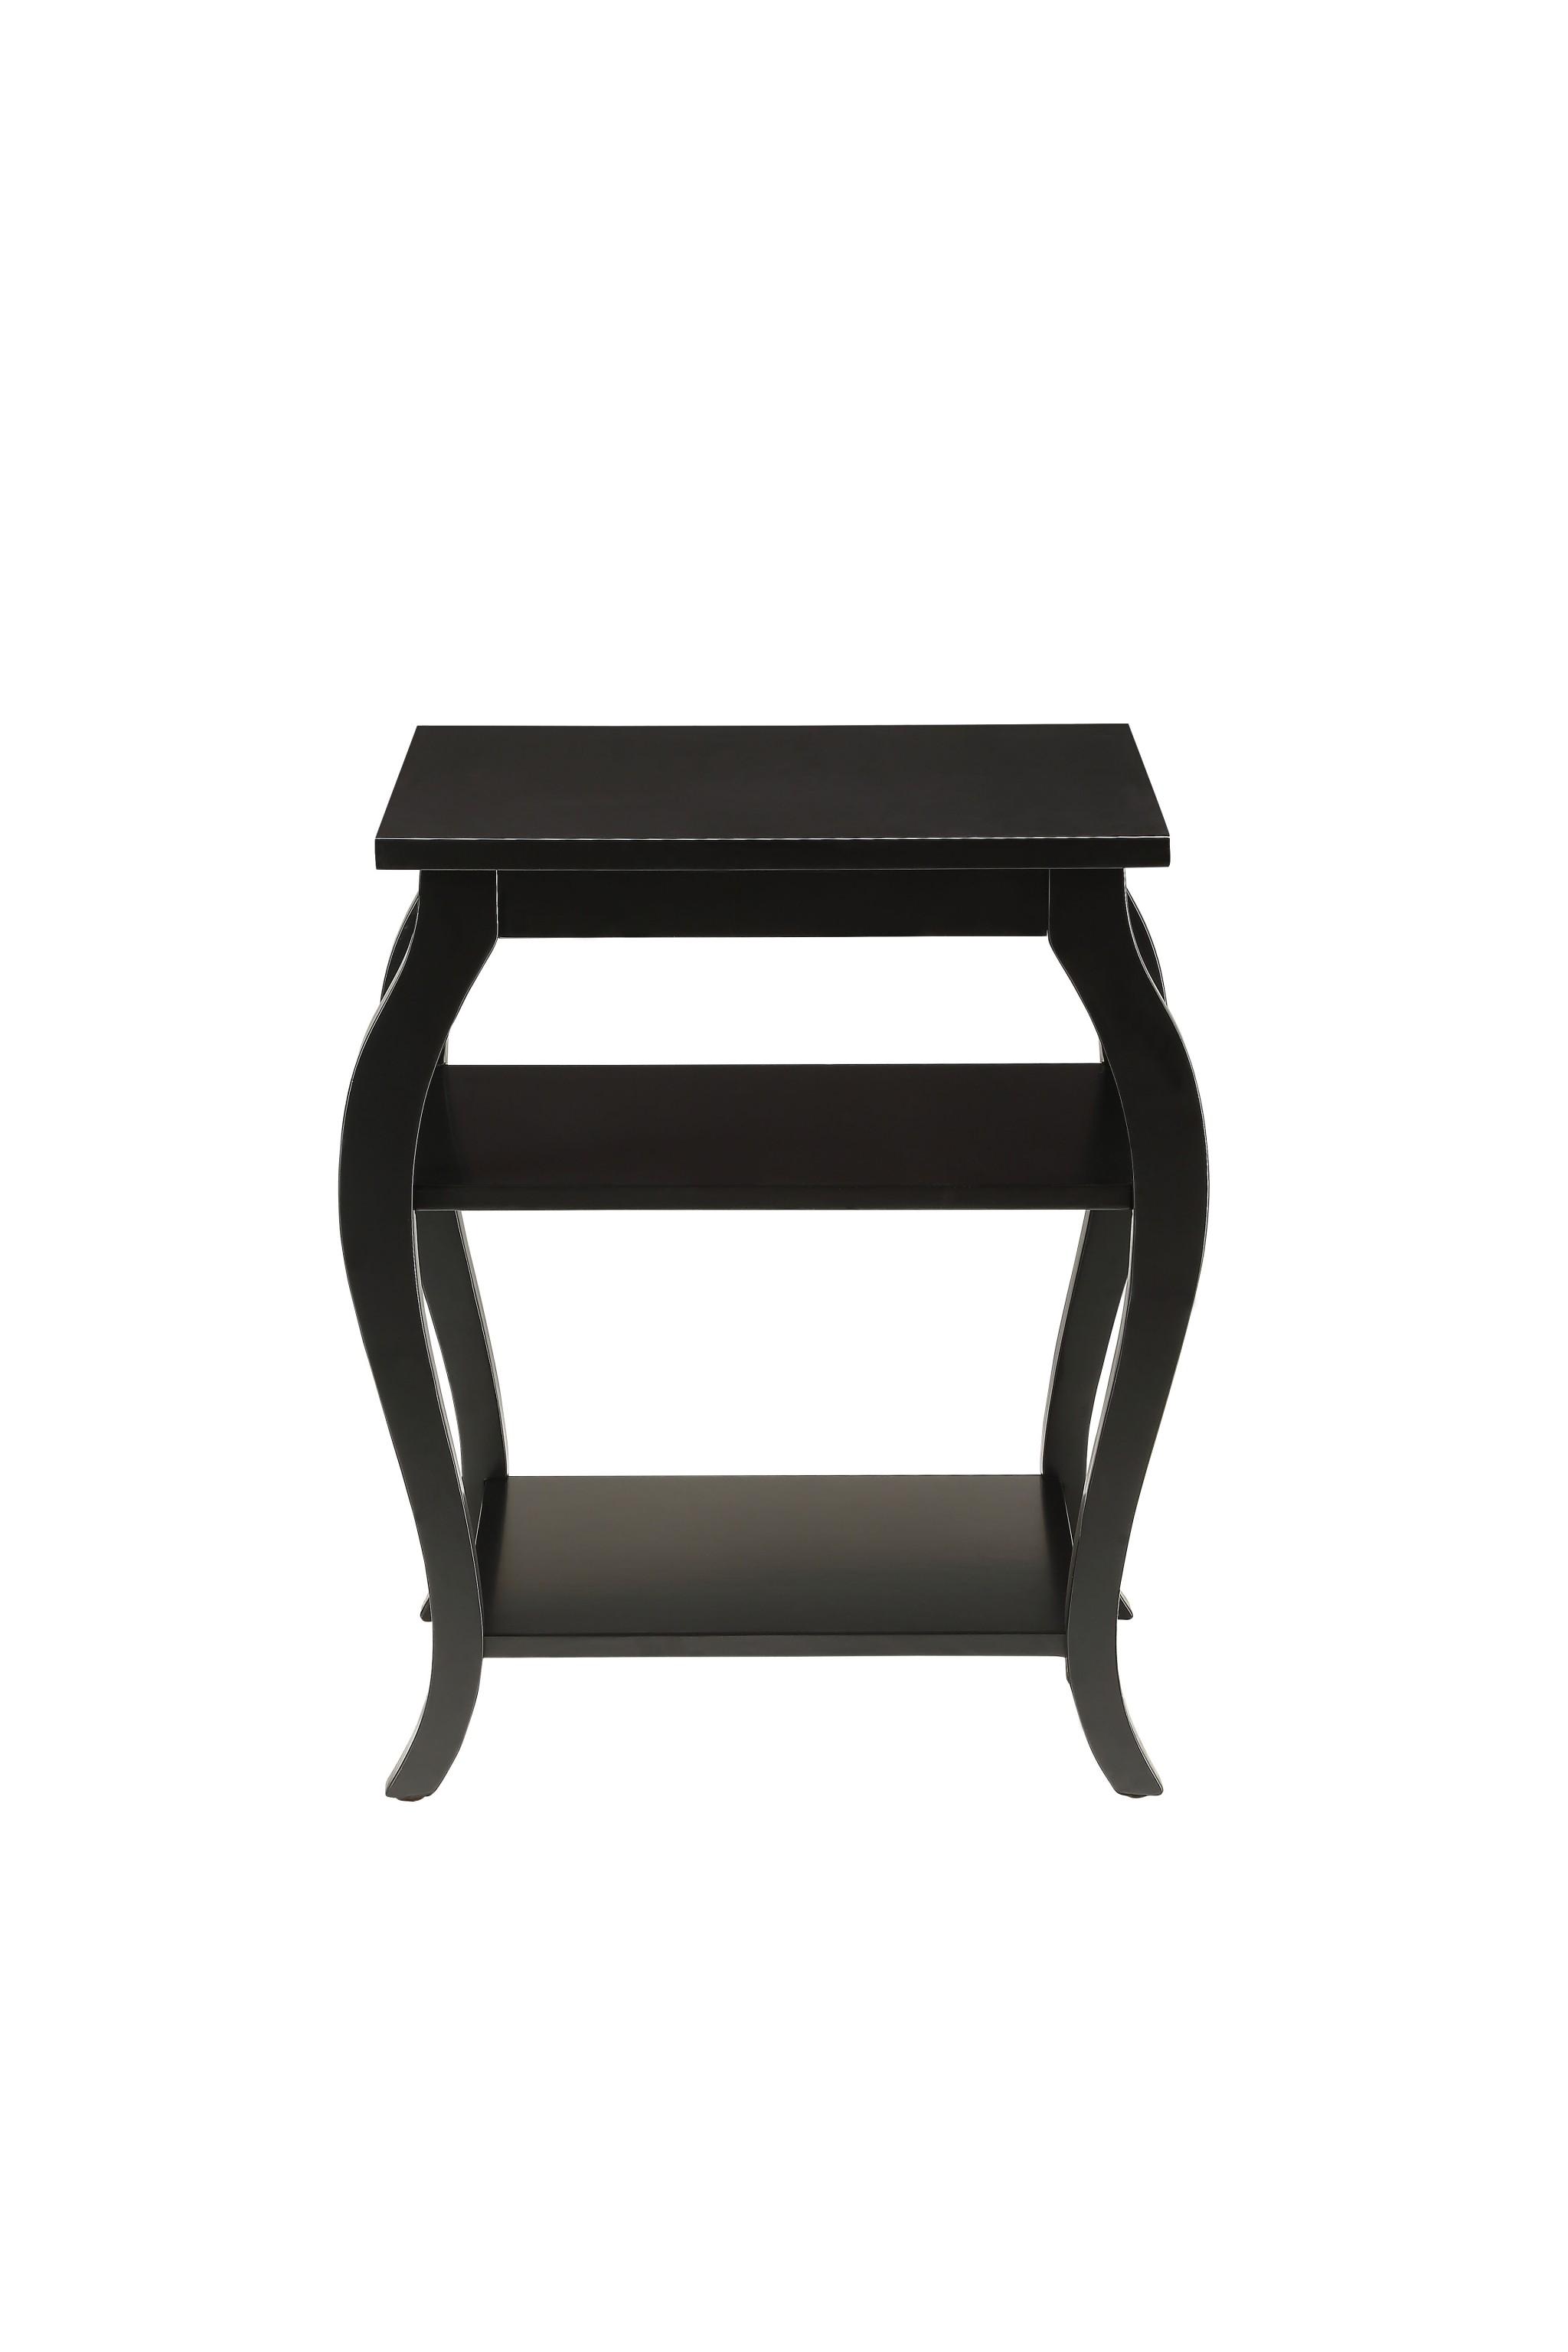 "20"" X 18"" X 23"" Black Solid Wood Leg End Table"